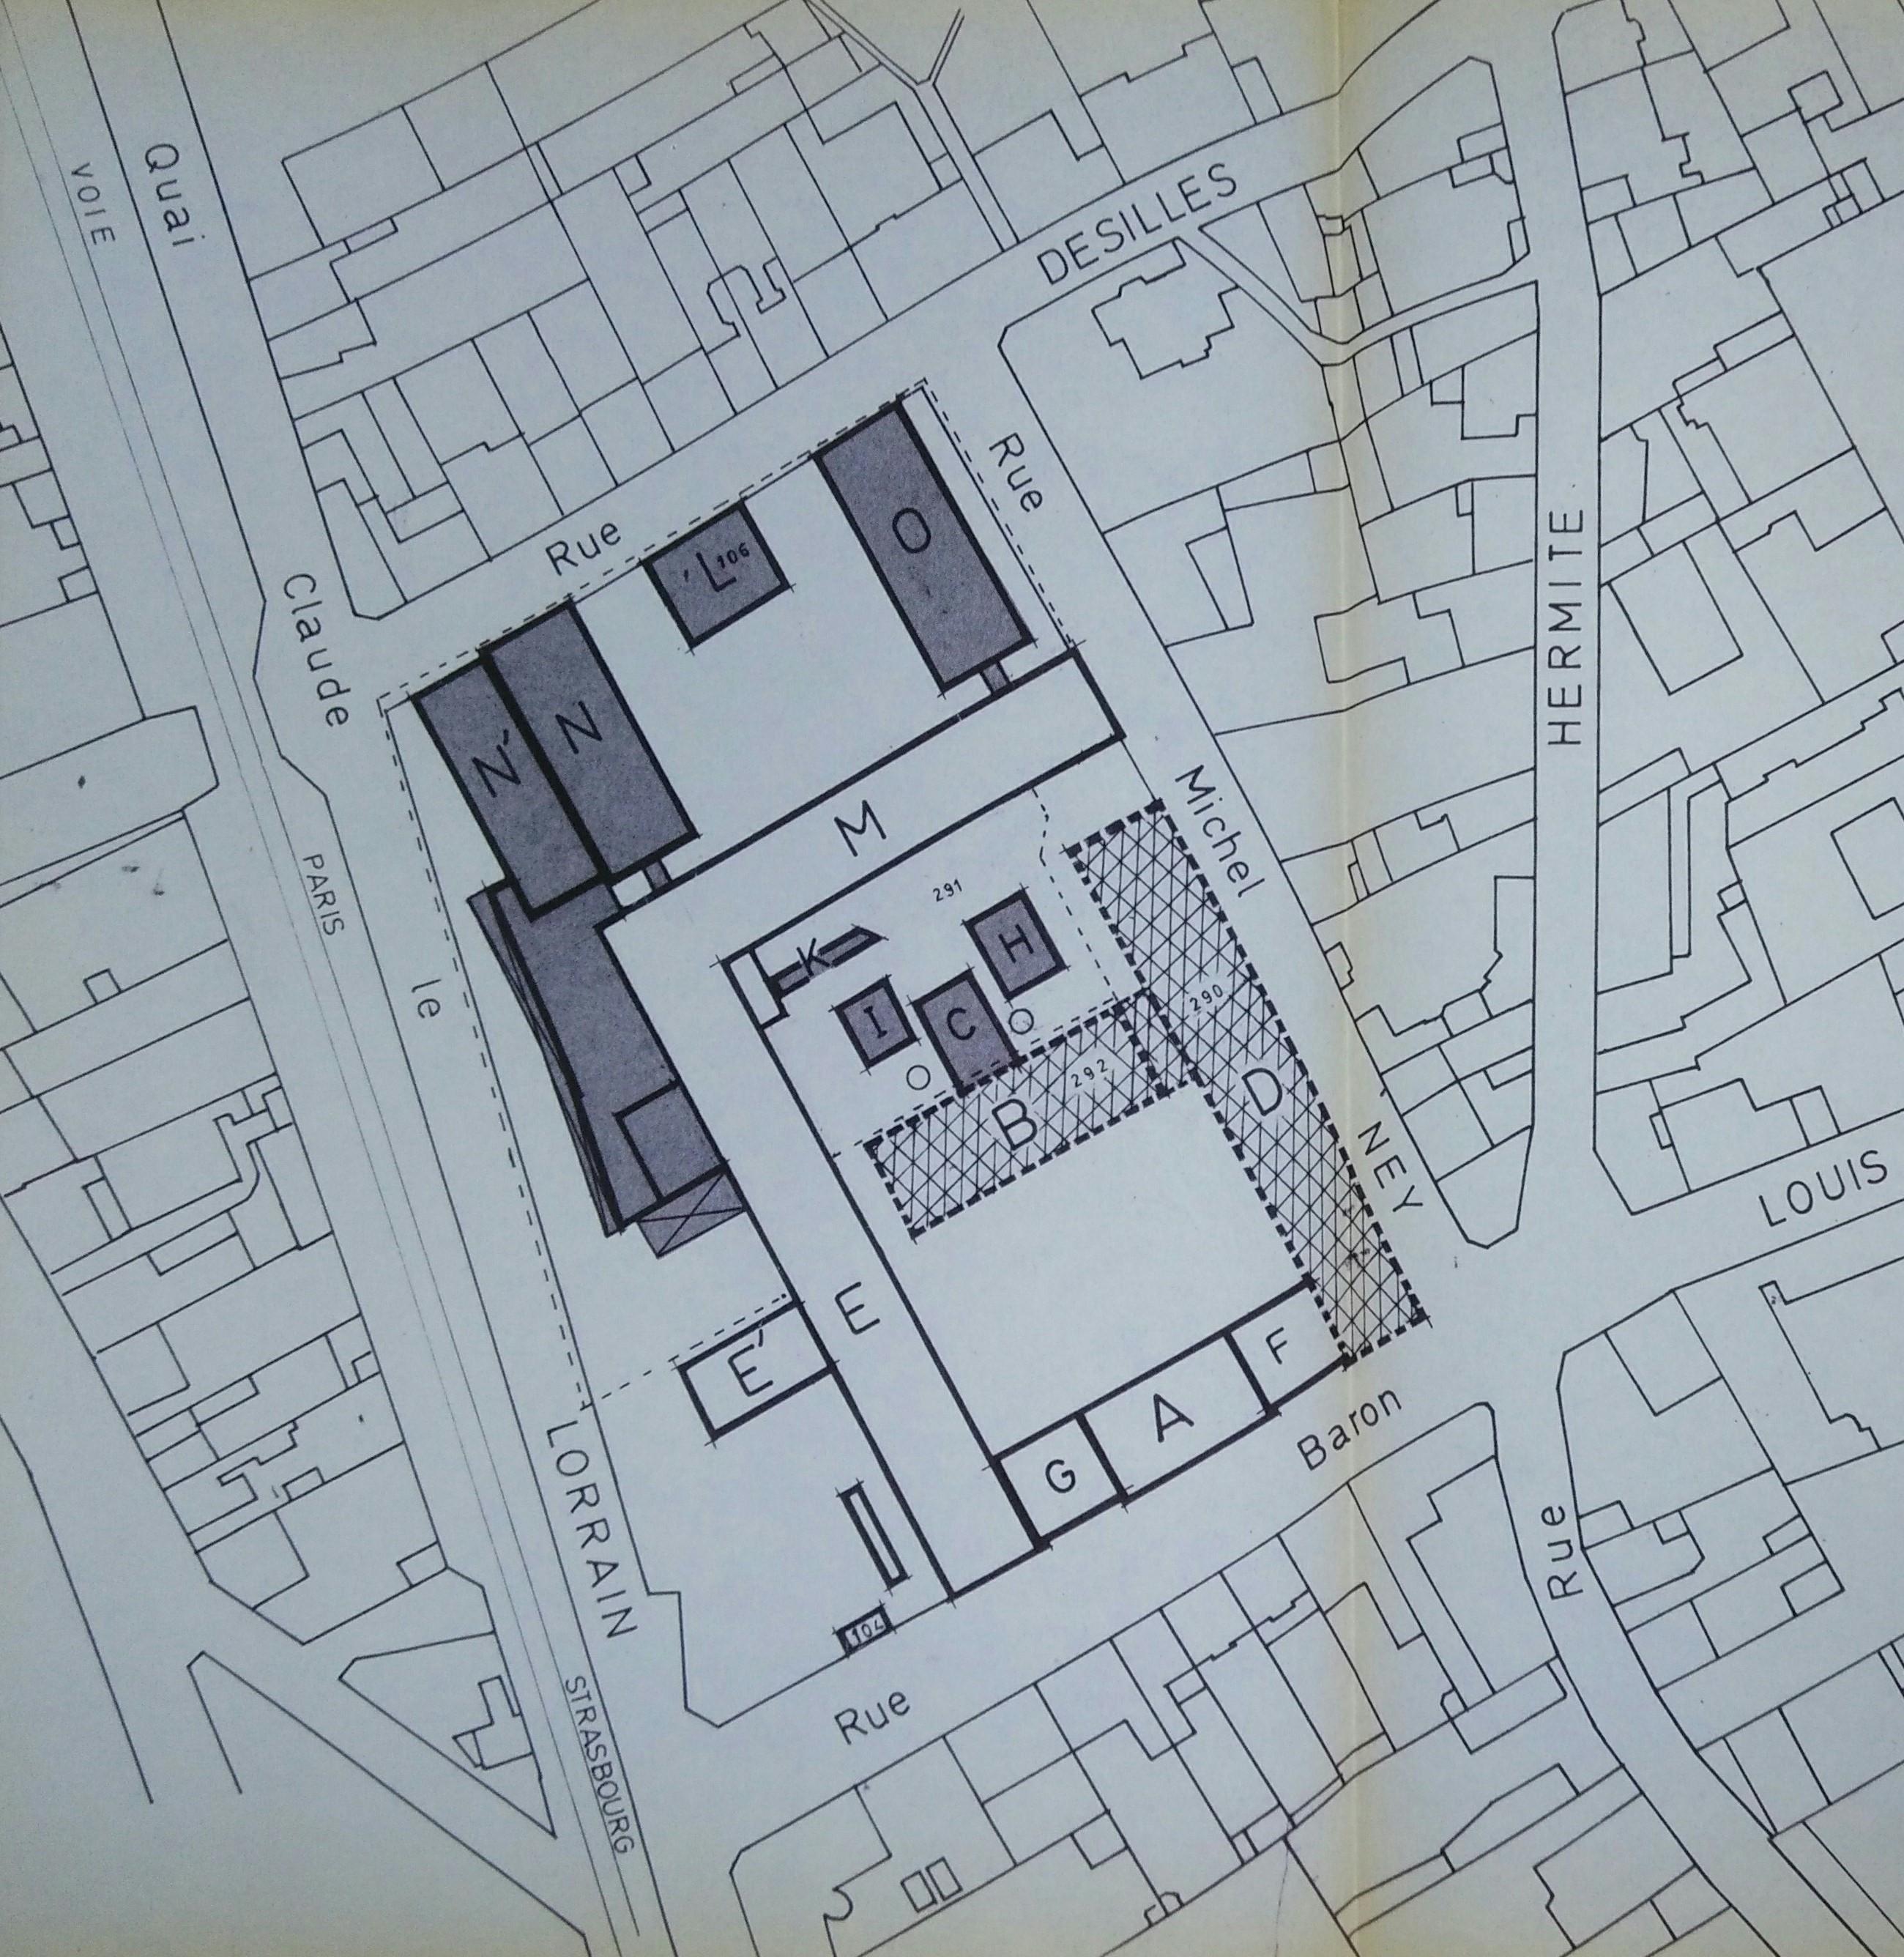 Plan de masse de 1987